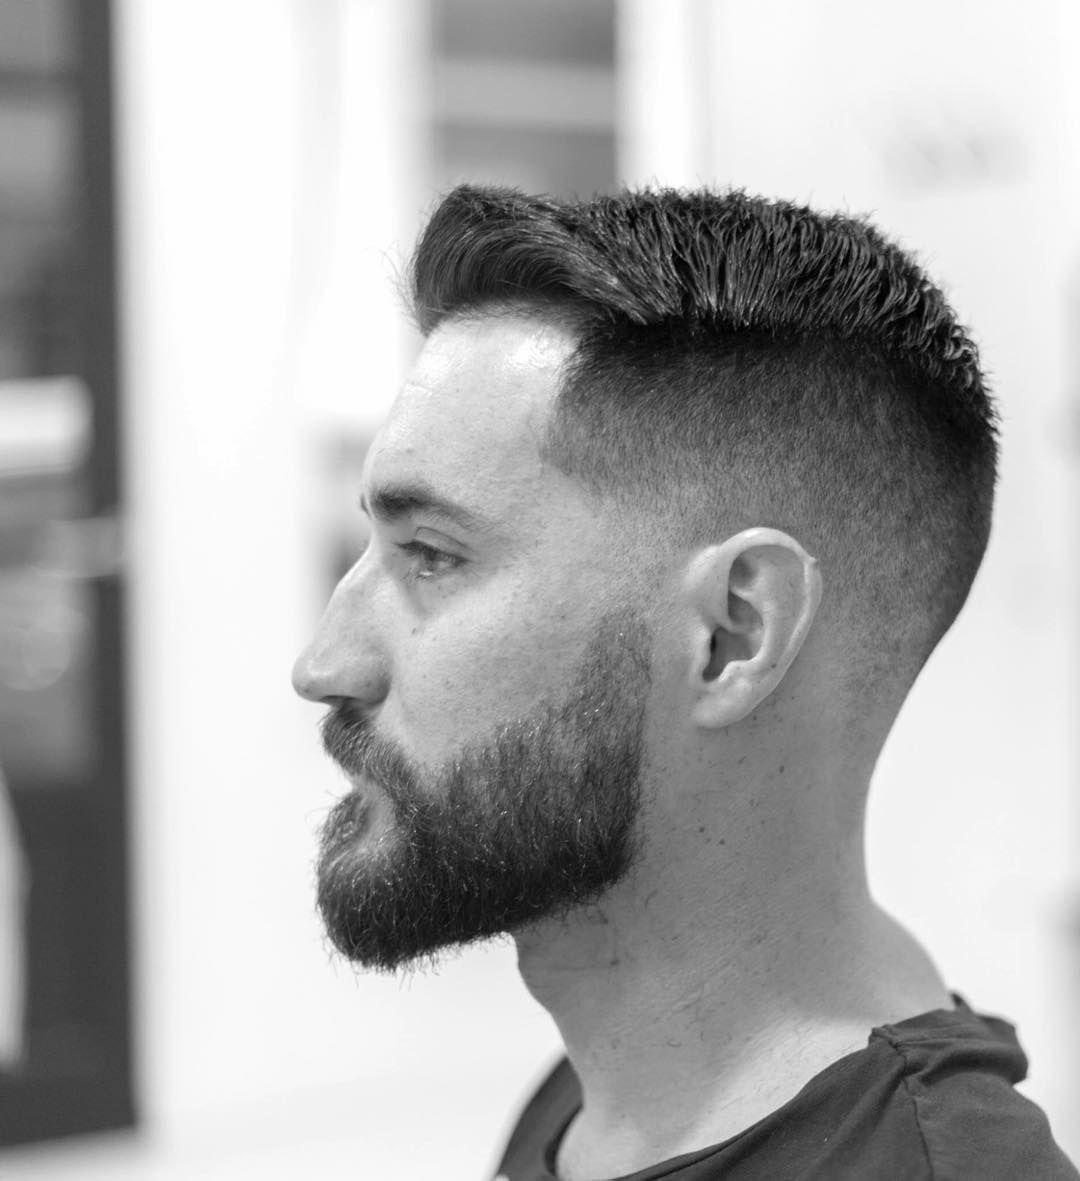 75 Inspiring Short Beard Styles The New Style 2019 Beard